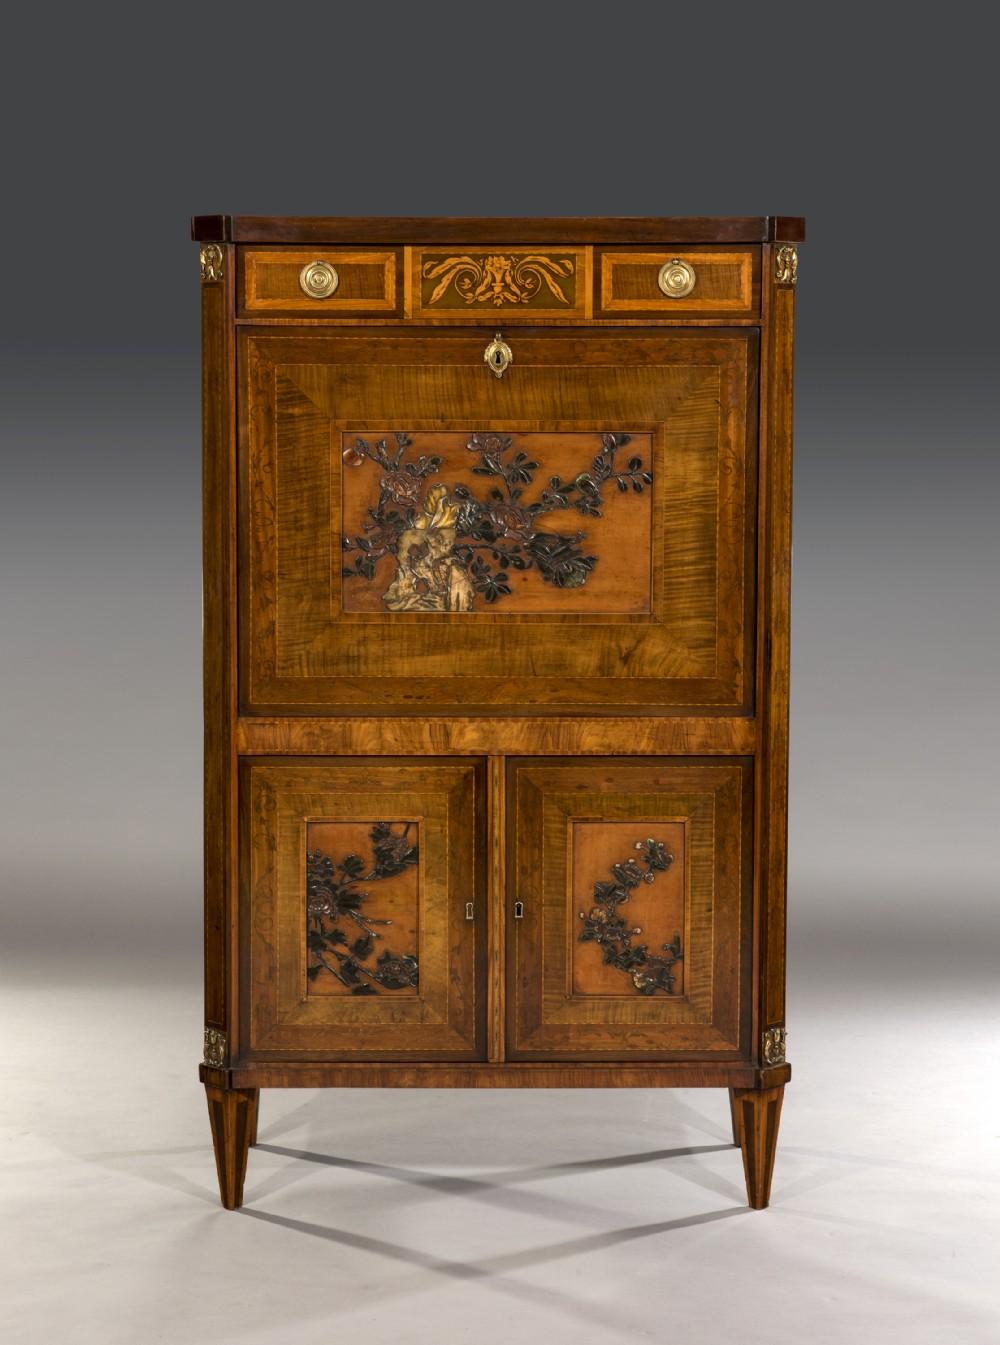 19th century mahogany escritoire